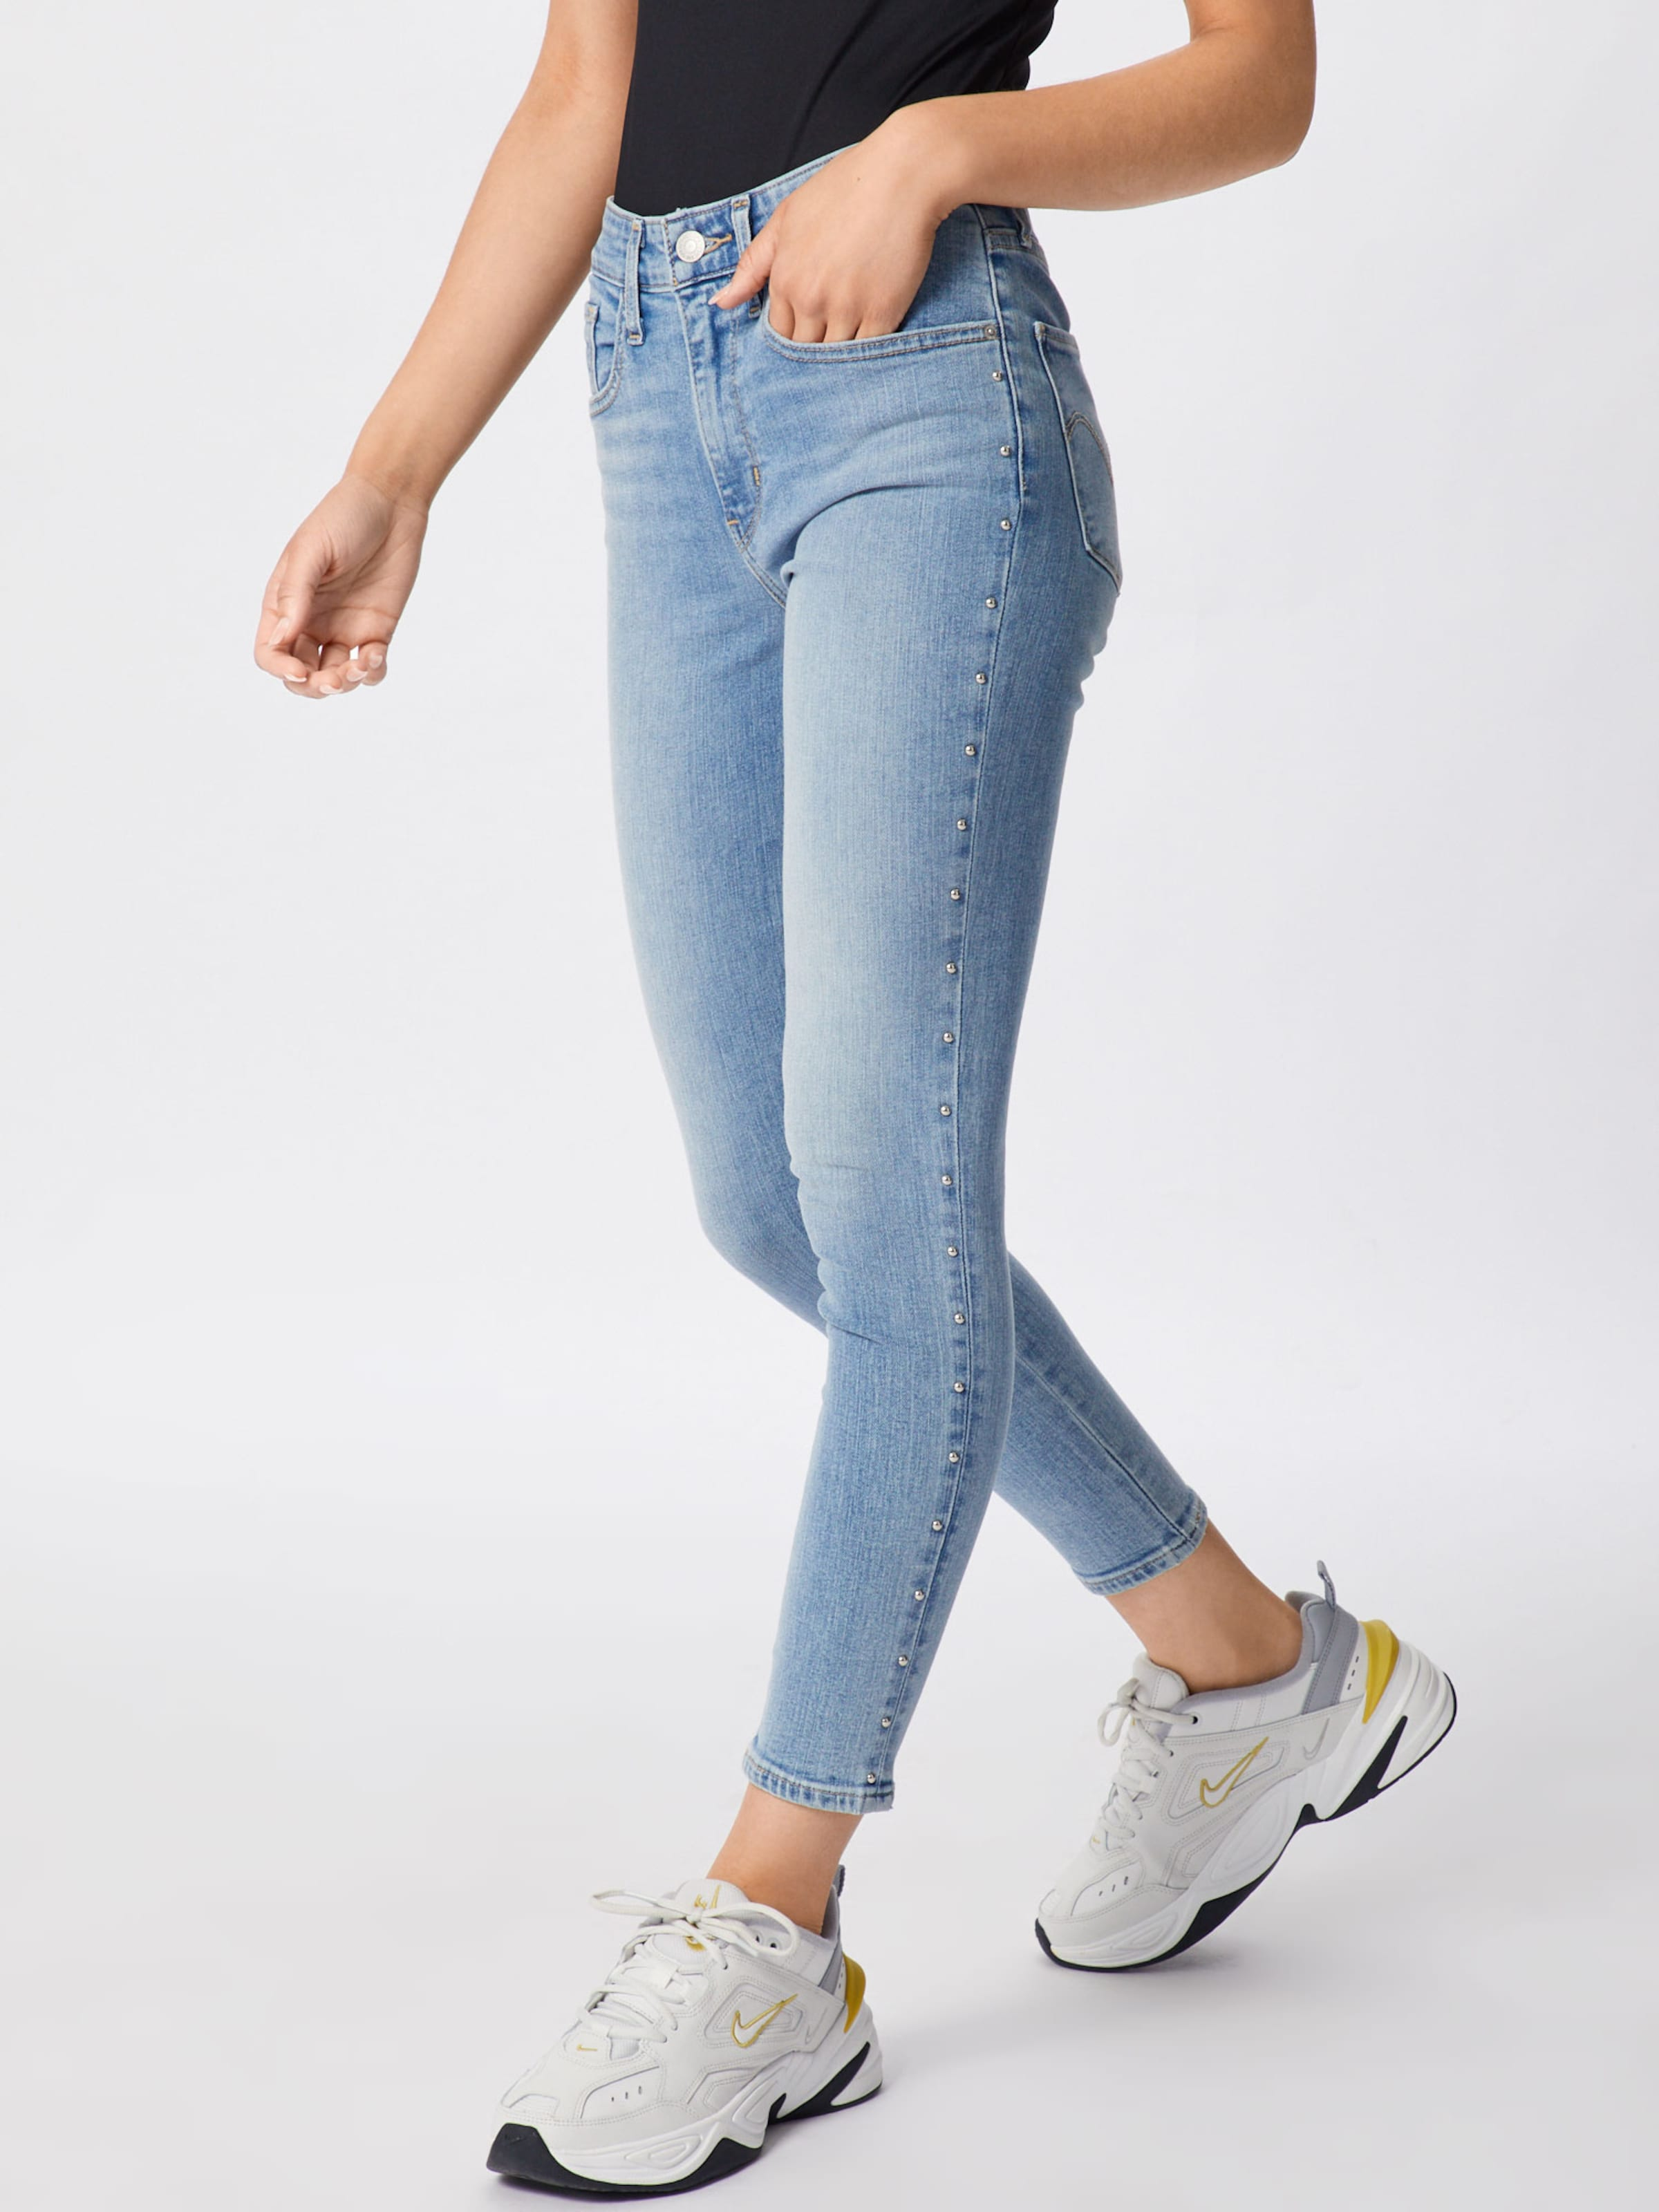 Blue Jeans Ankle' In '721� Denim Rise hi Skinny Levi's 5RLq3j4A